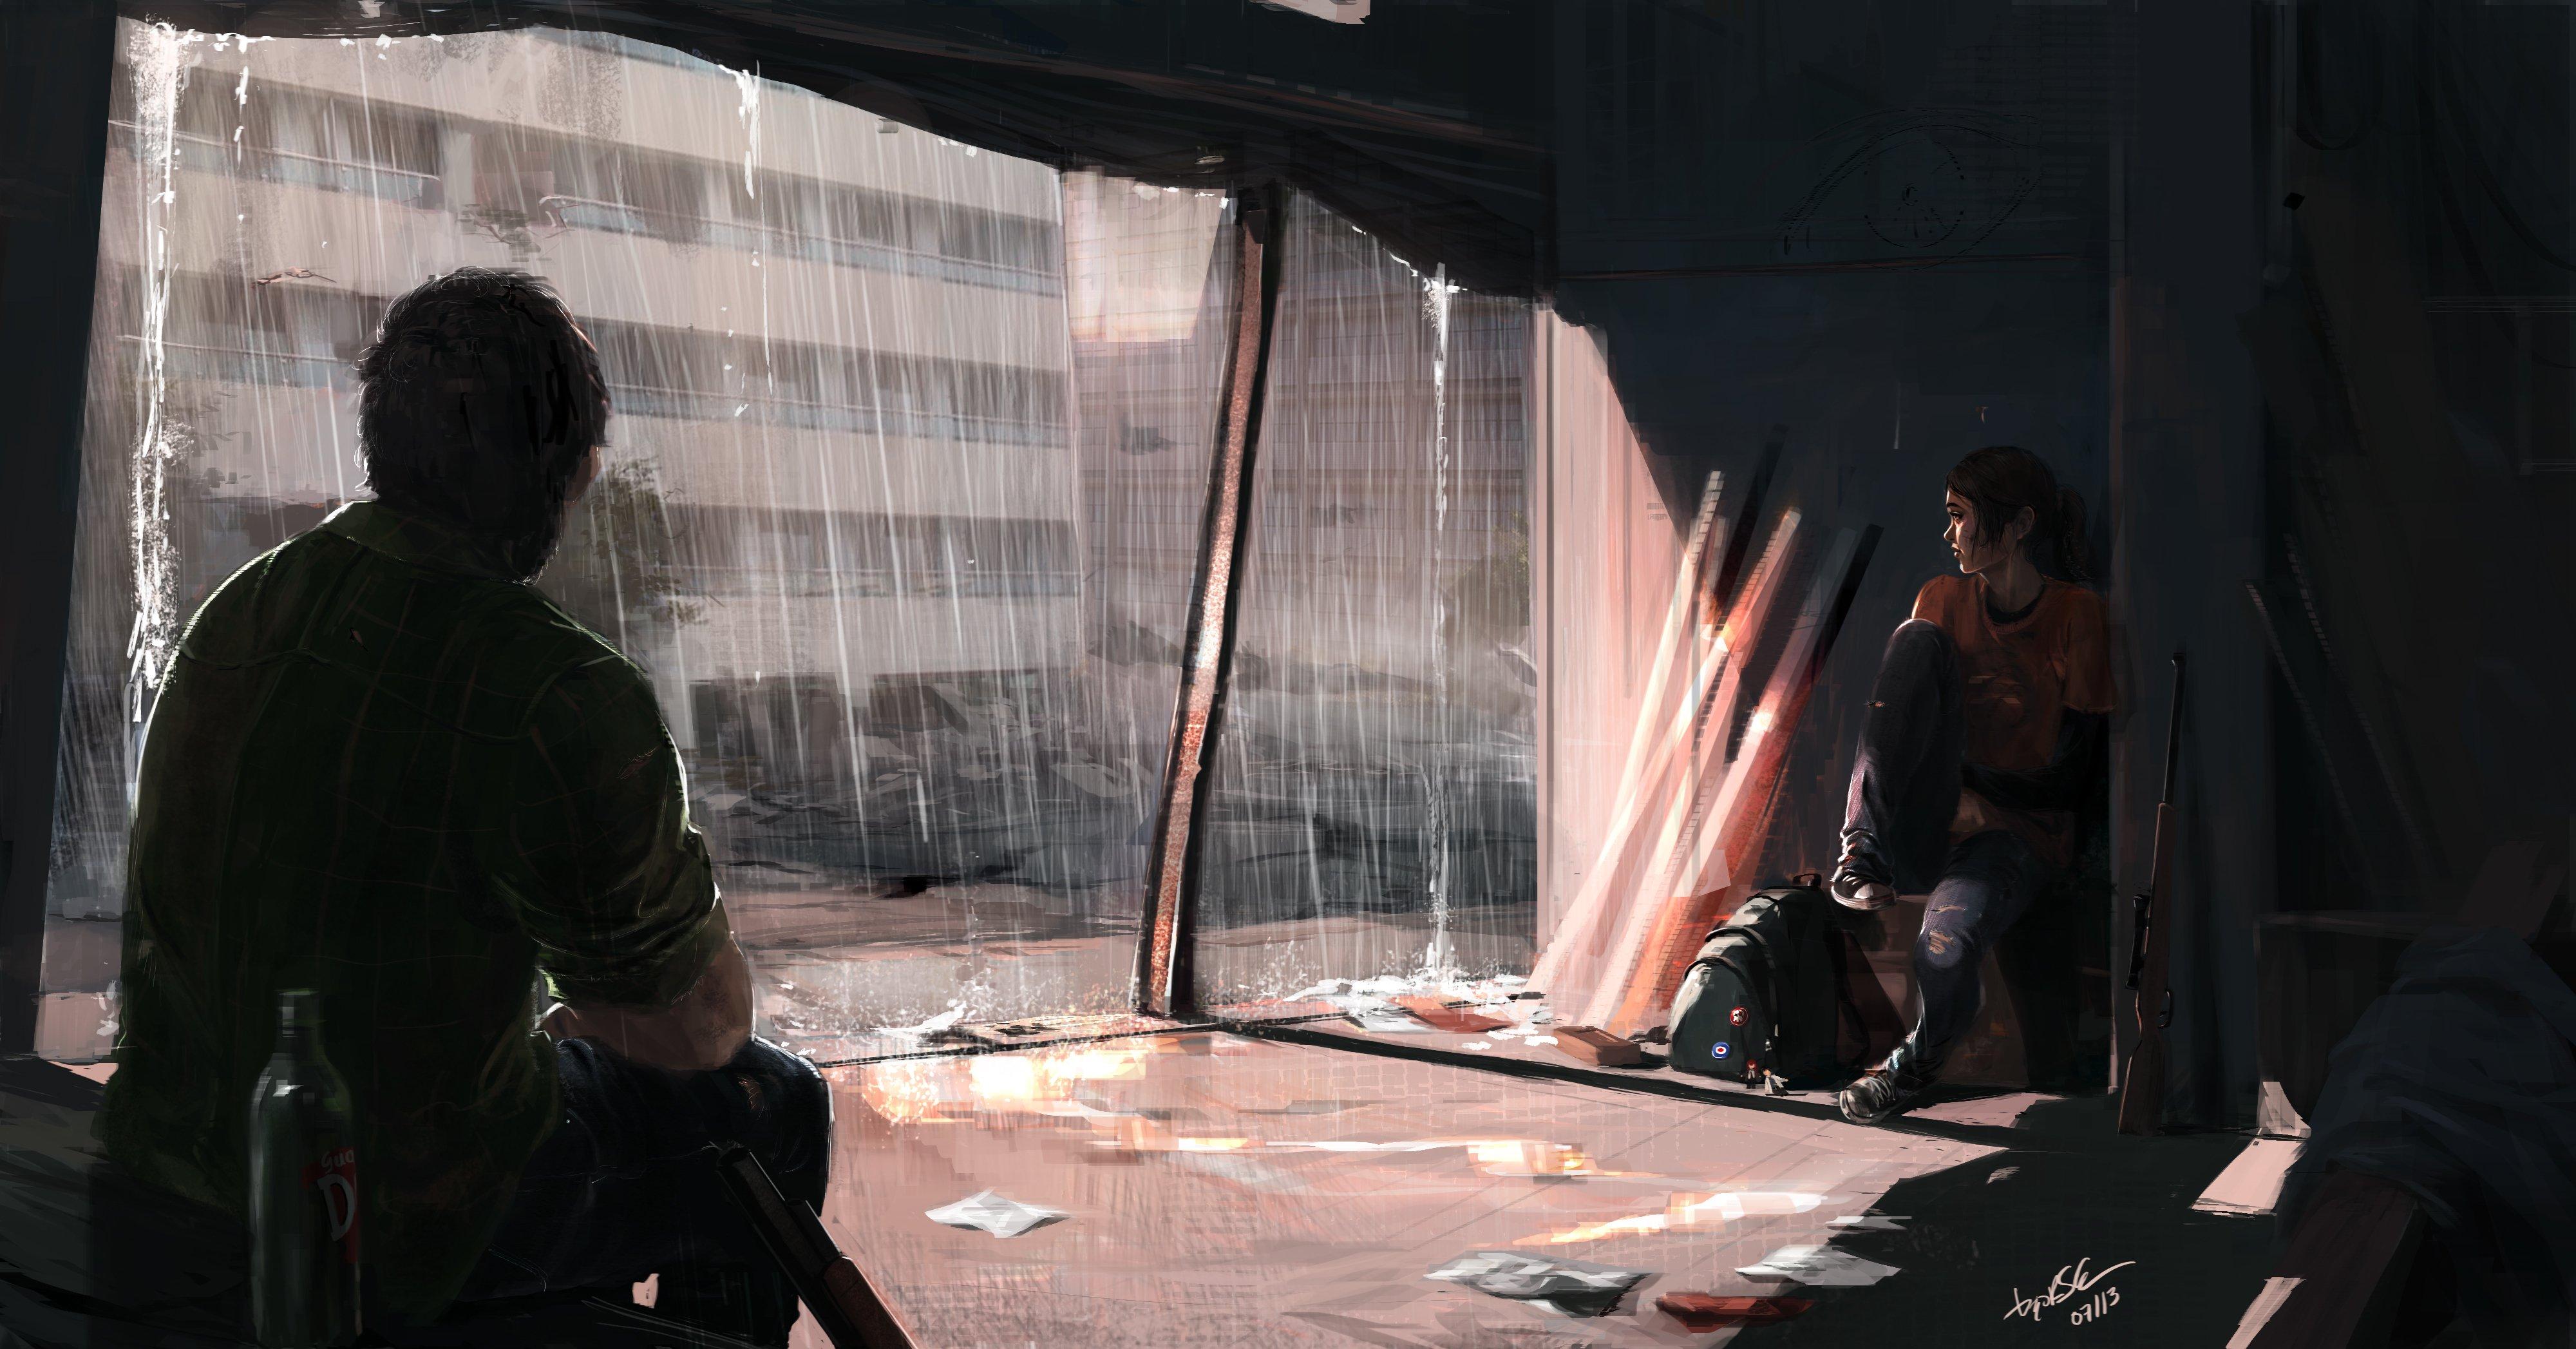 The Last Of Us Дополнение\ не пропустите! - Изображение 1